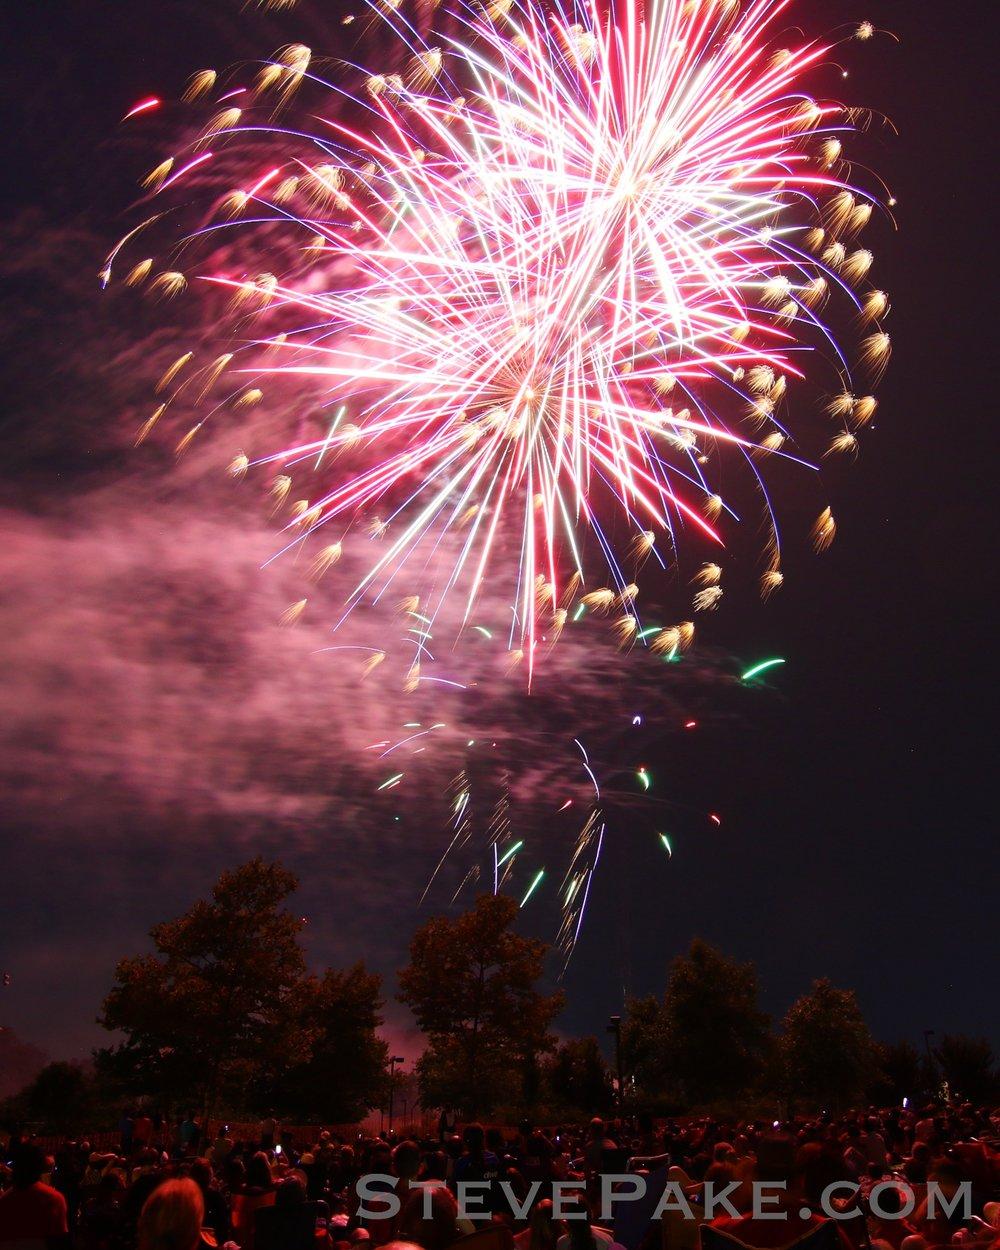 Fireworks2018_60_GE3A8611ap-HD-WM.jpg